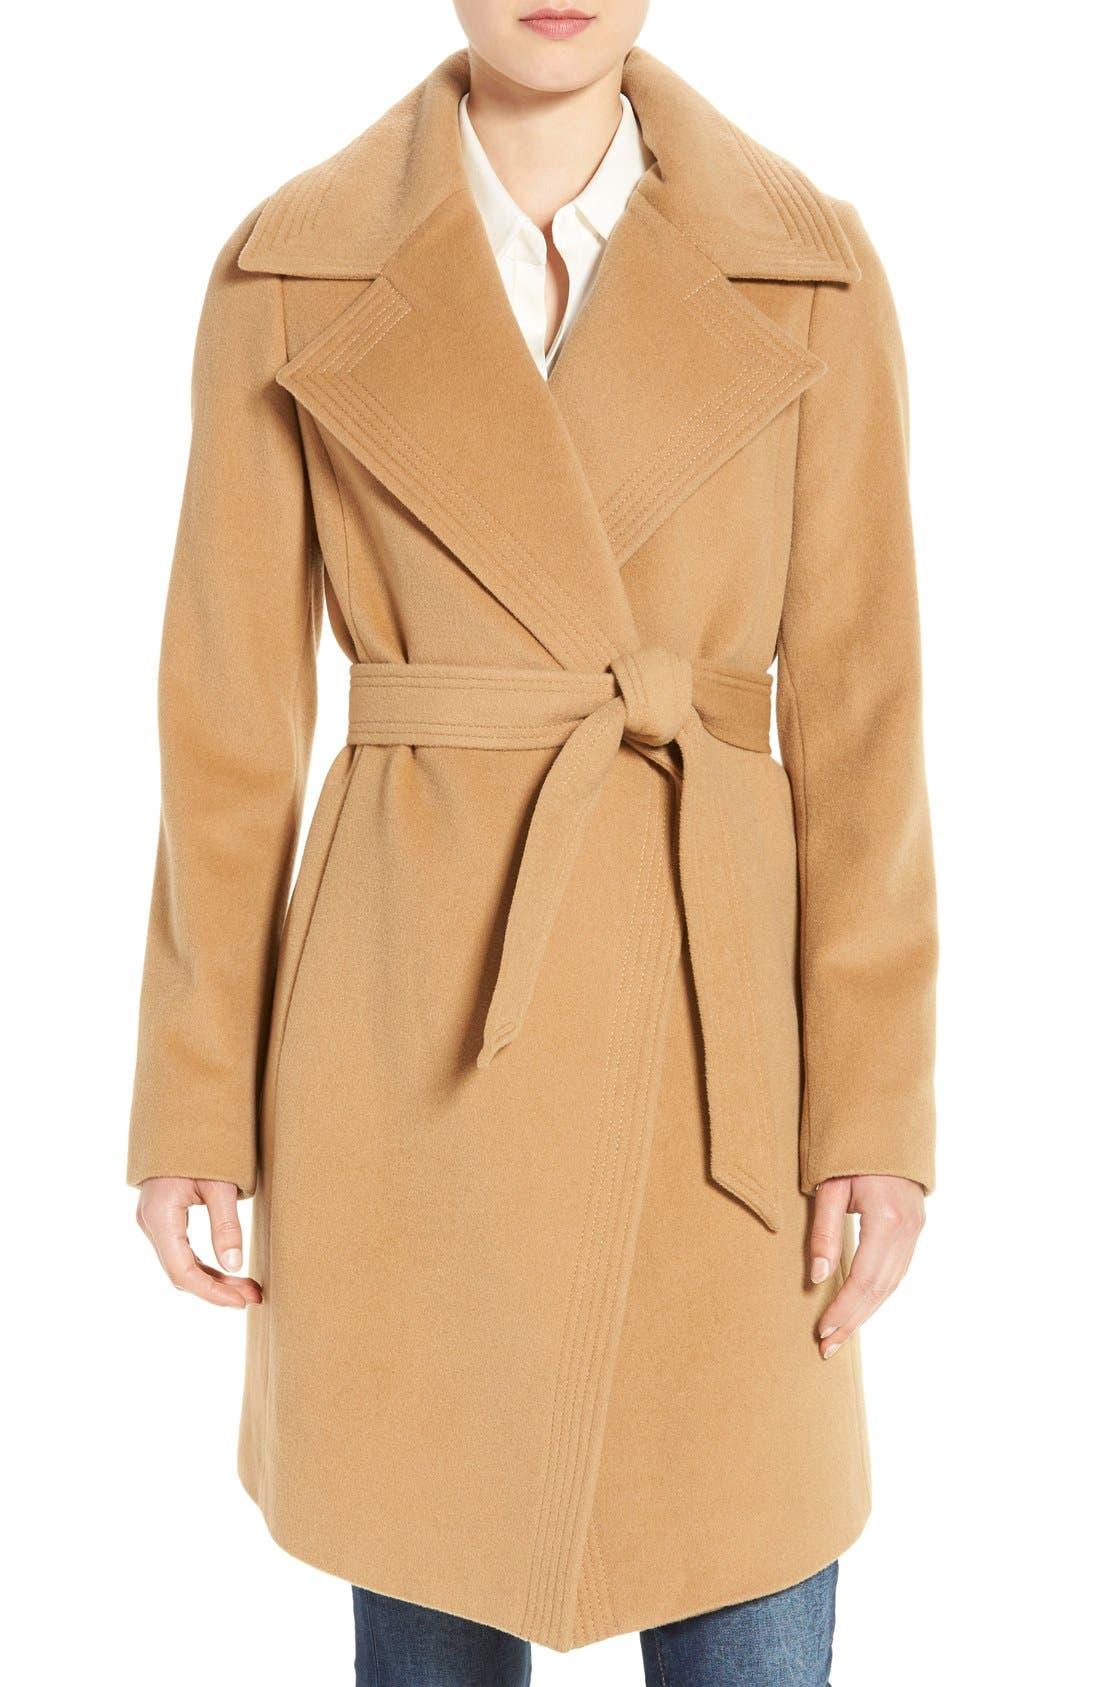 Alternate Image 1 Selected - Diane von Furstenberg Wool Blend Wrap Coat